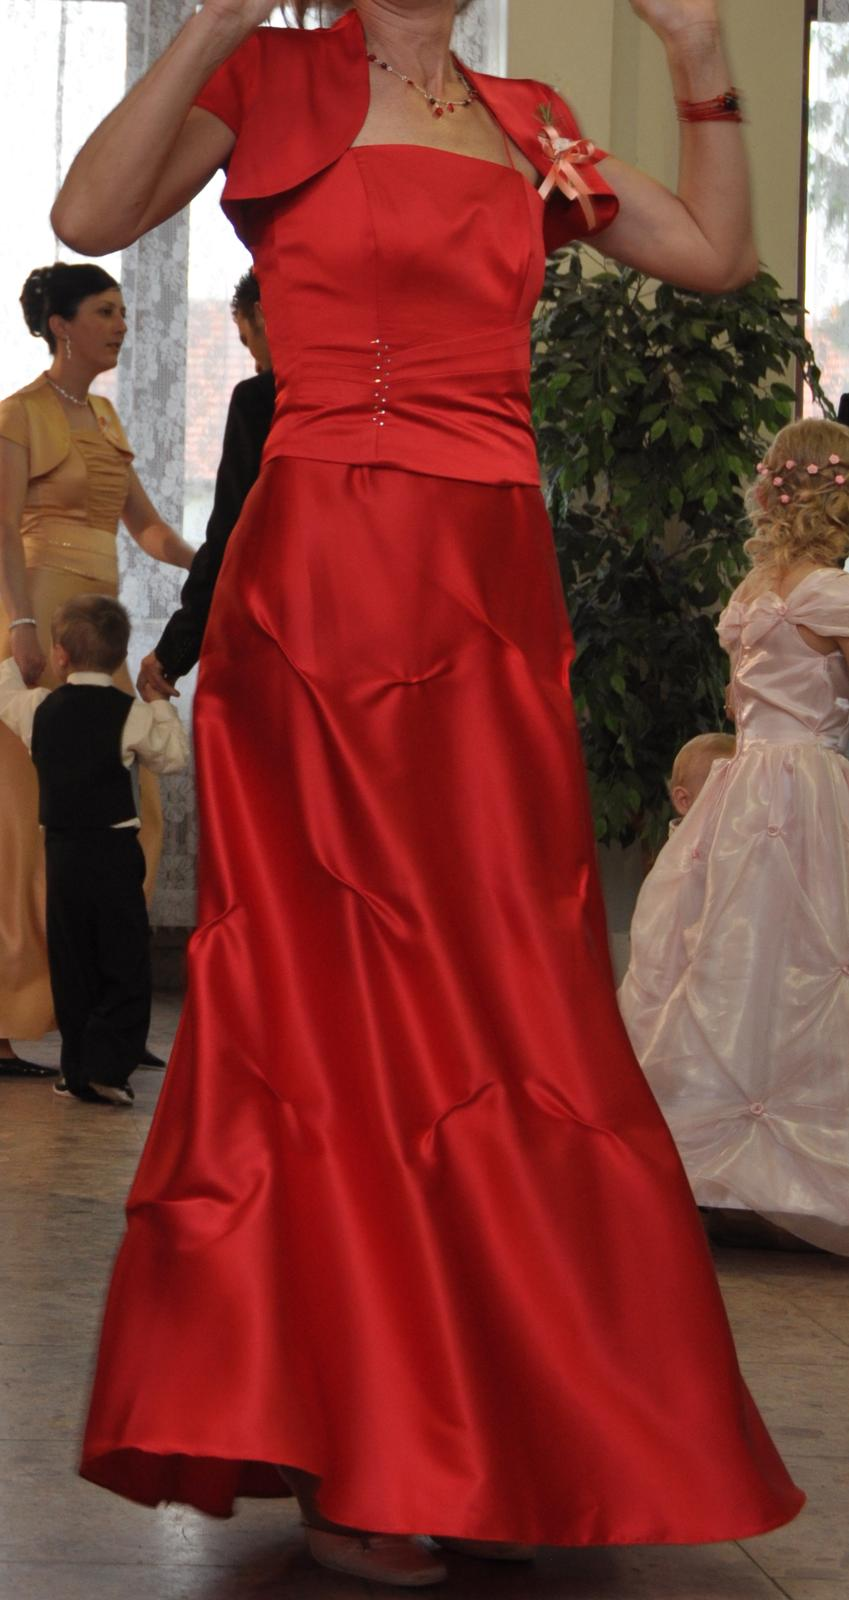 a77f9c43a3d7 Spoločenské šaty (dlhá sukňa + korzet + bolerko)